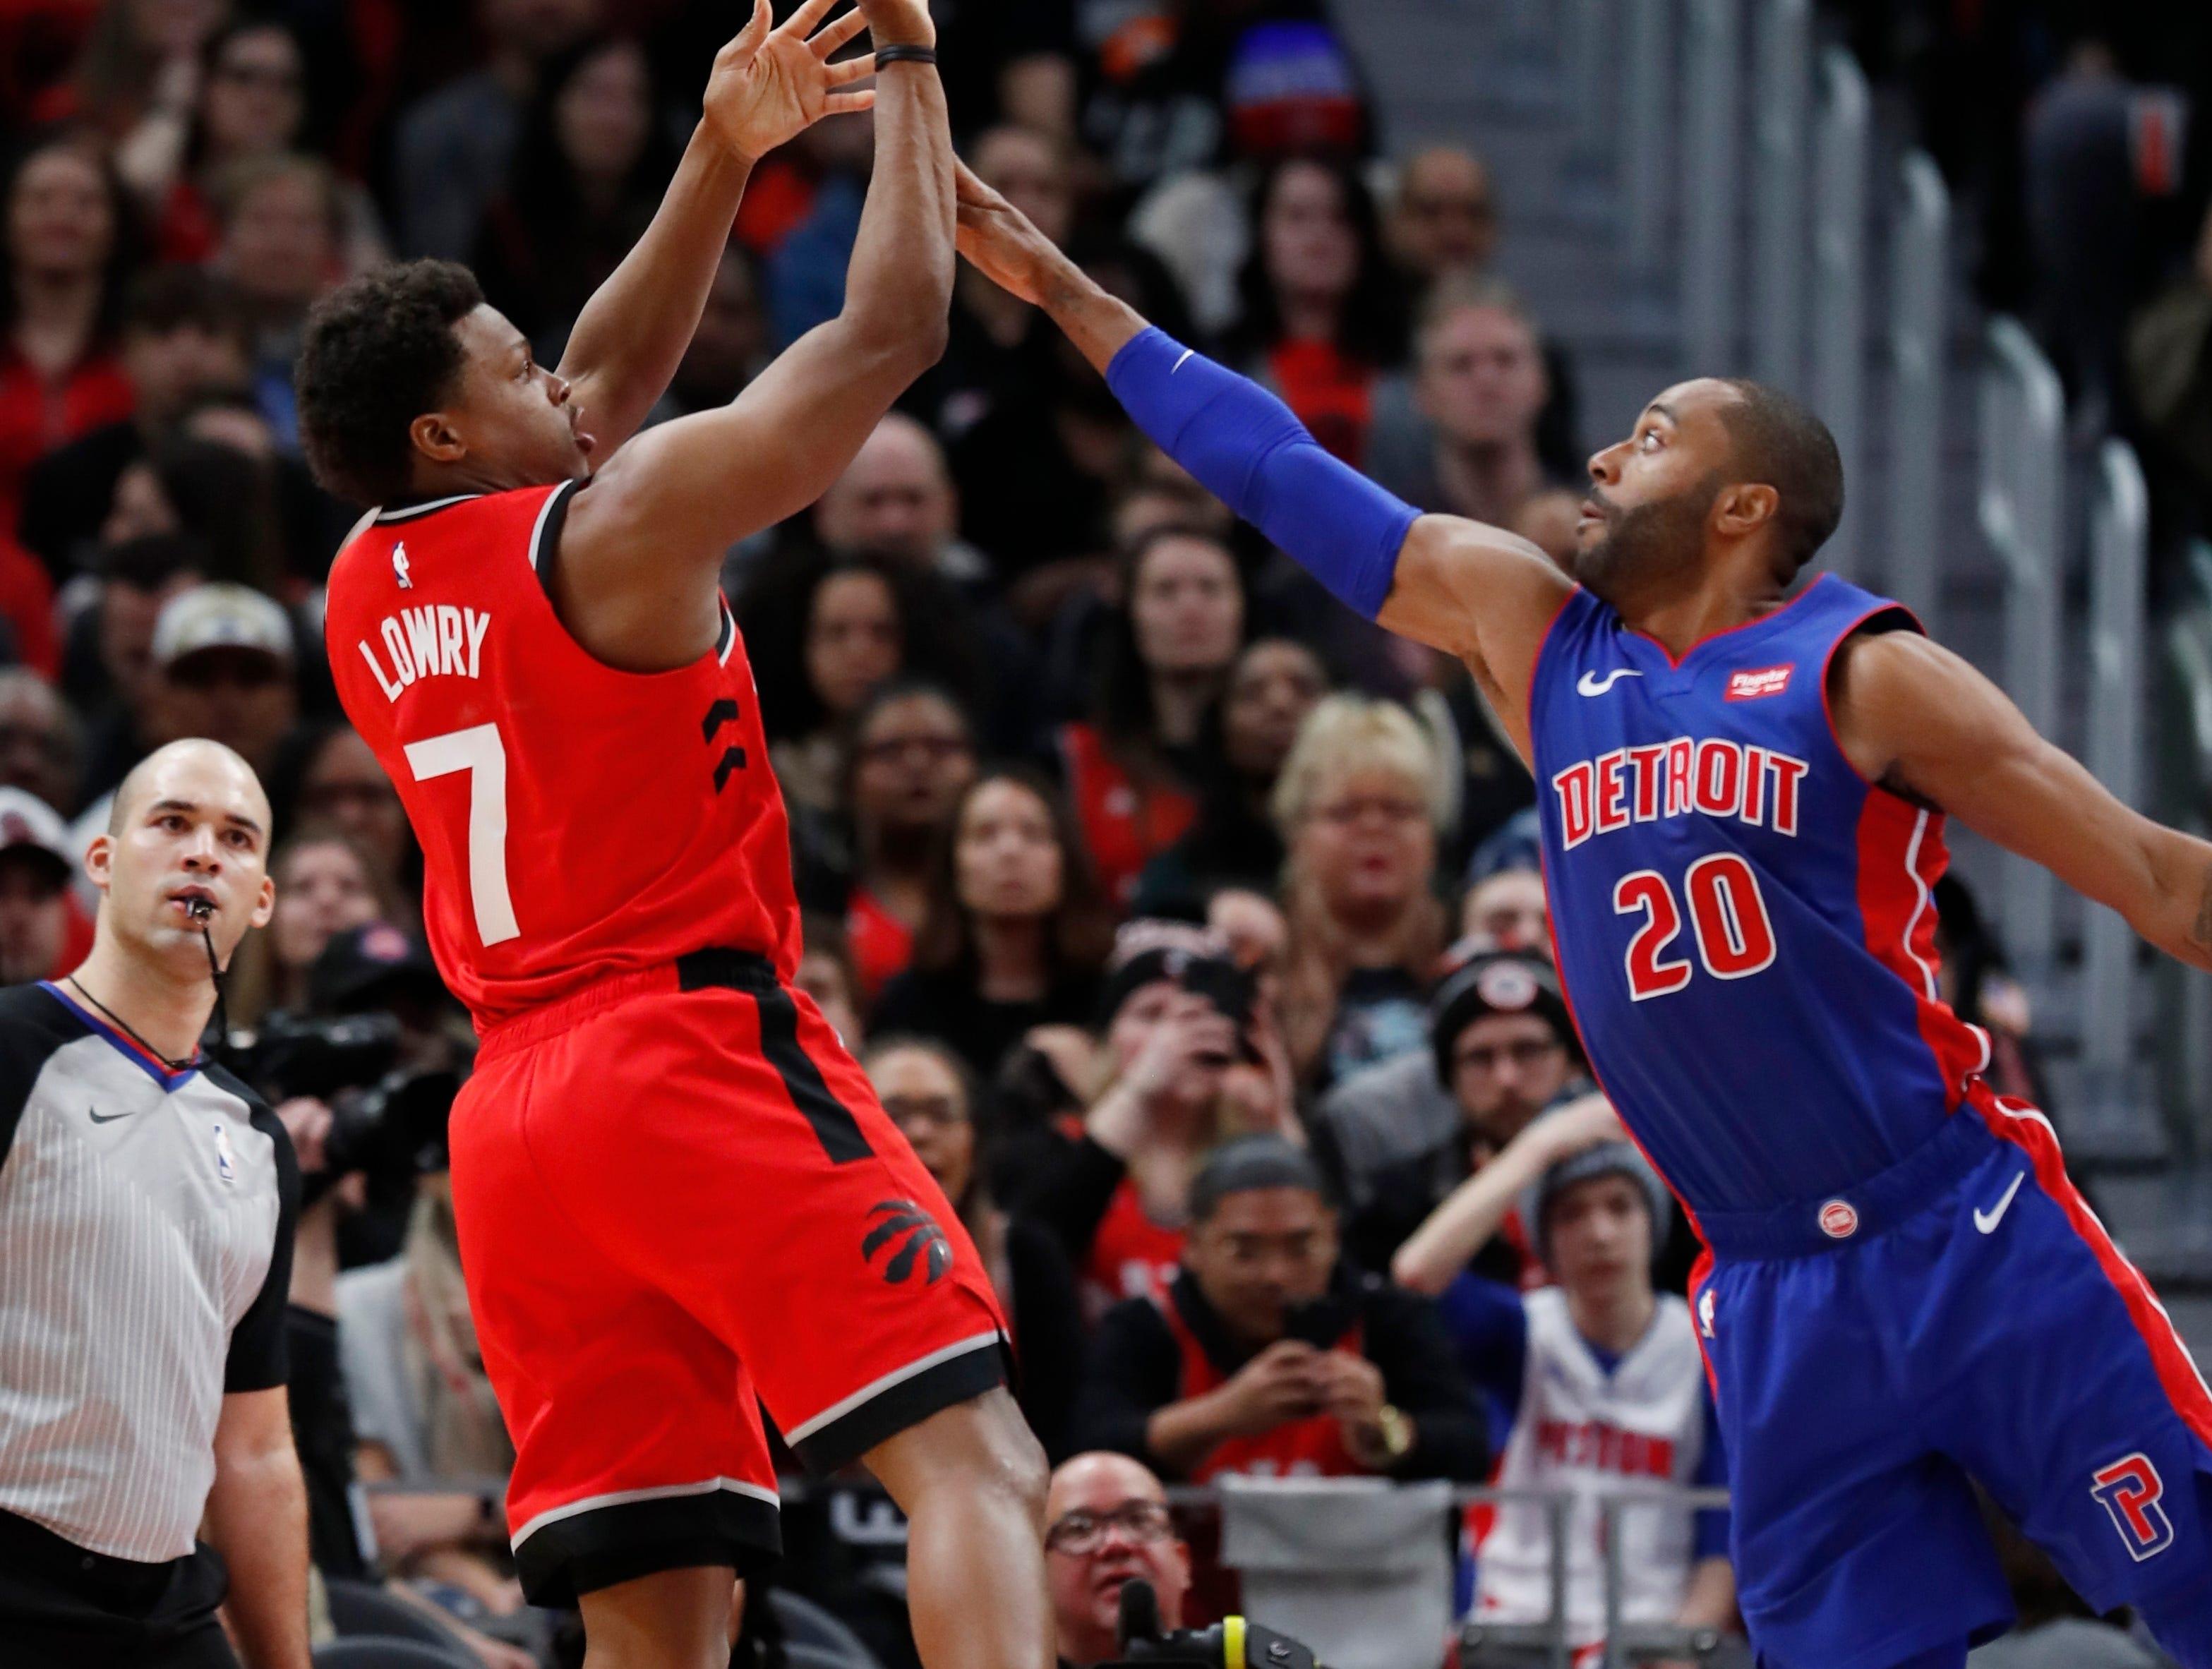 Toronto Raptors guard Kyle Lowry (7) shoots as Detroit Pistons guard Wayne Ellington (20) defends during the first half.